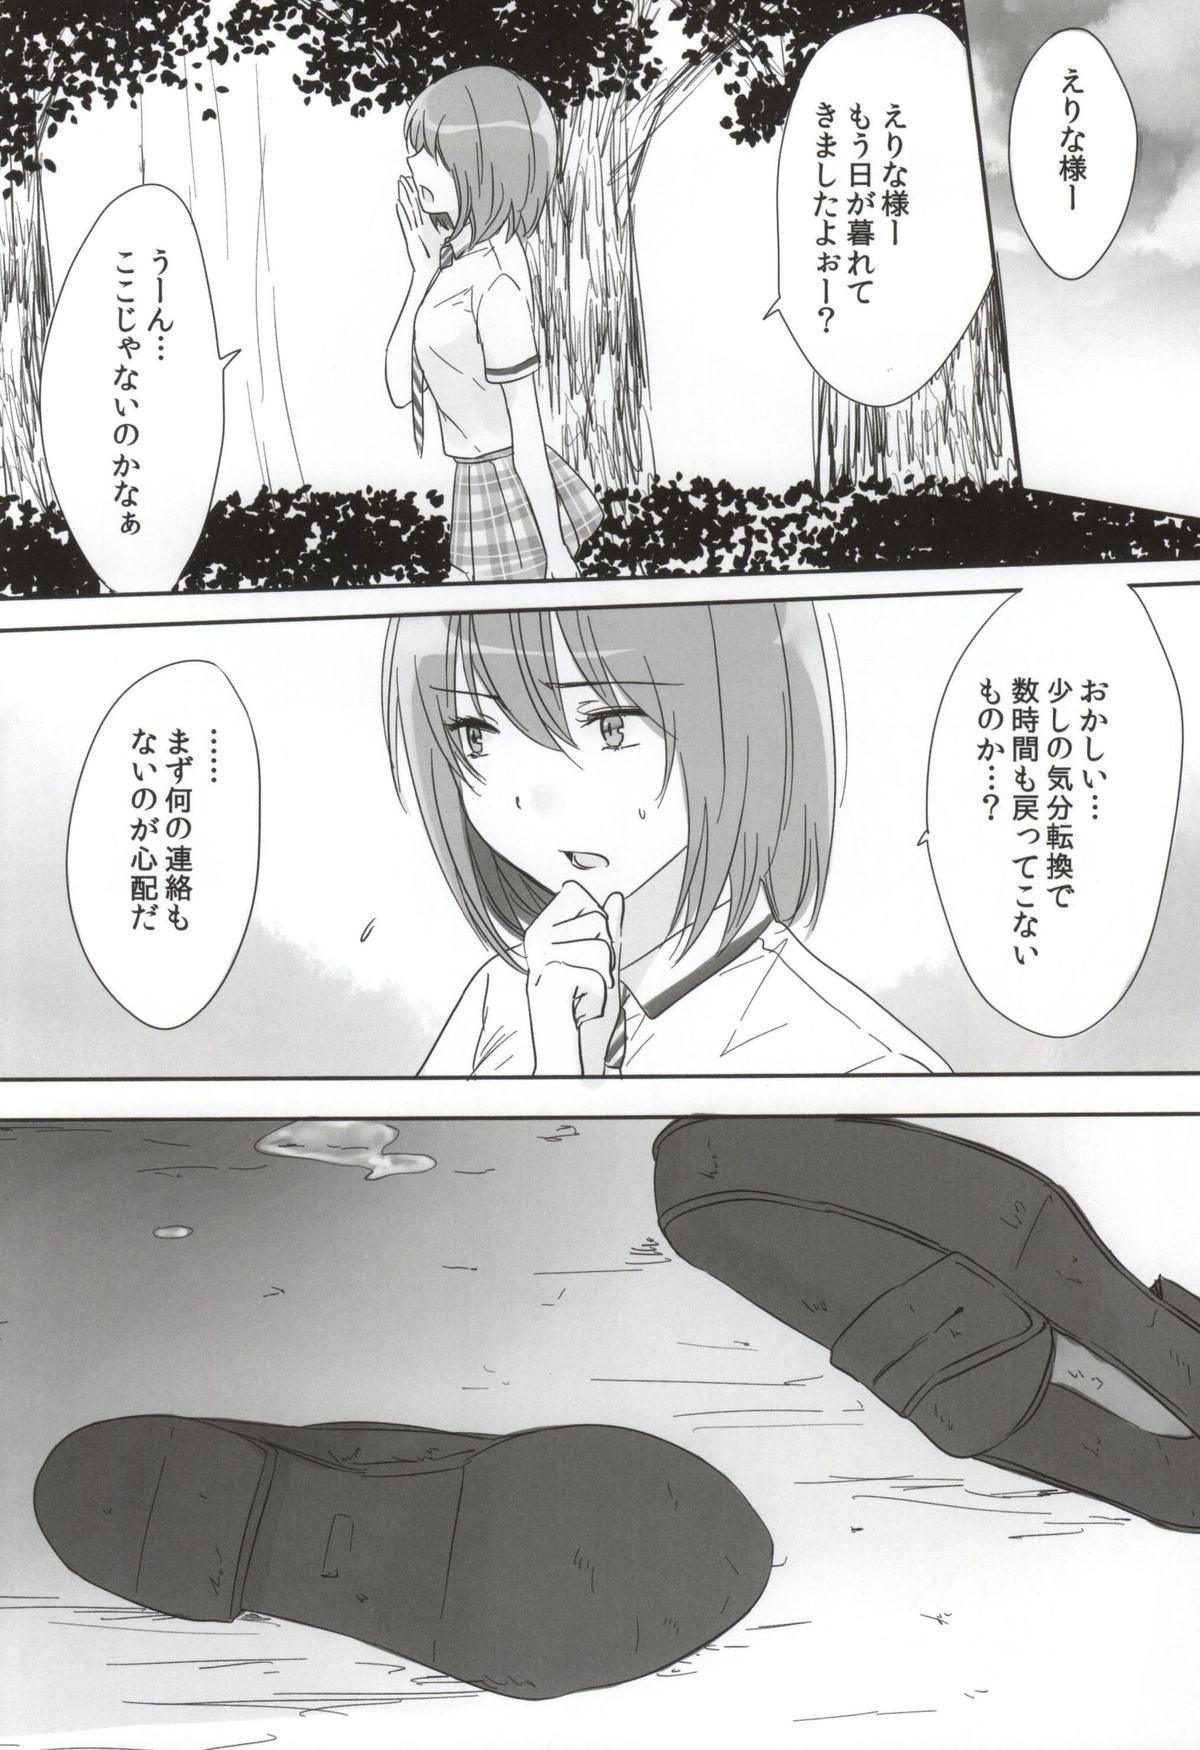 Erina-sama Tsukamaeta 14